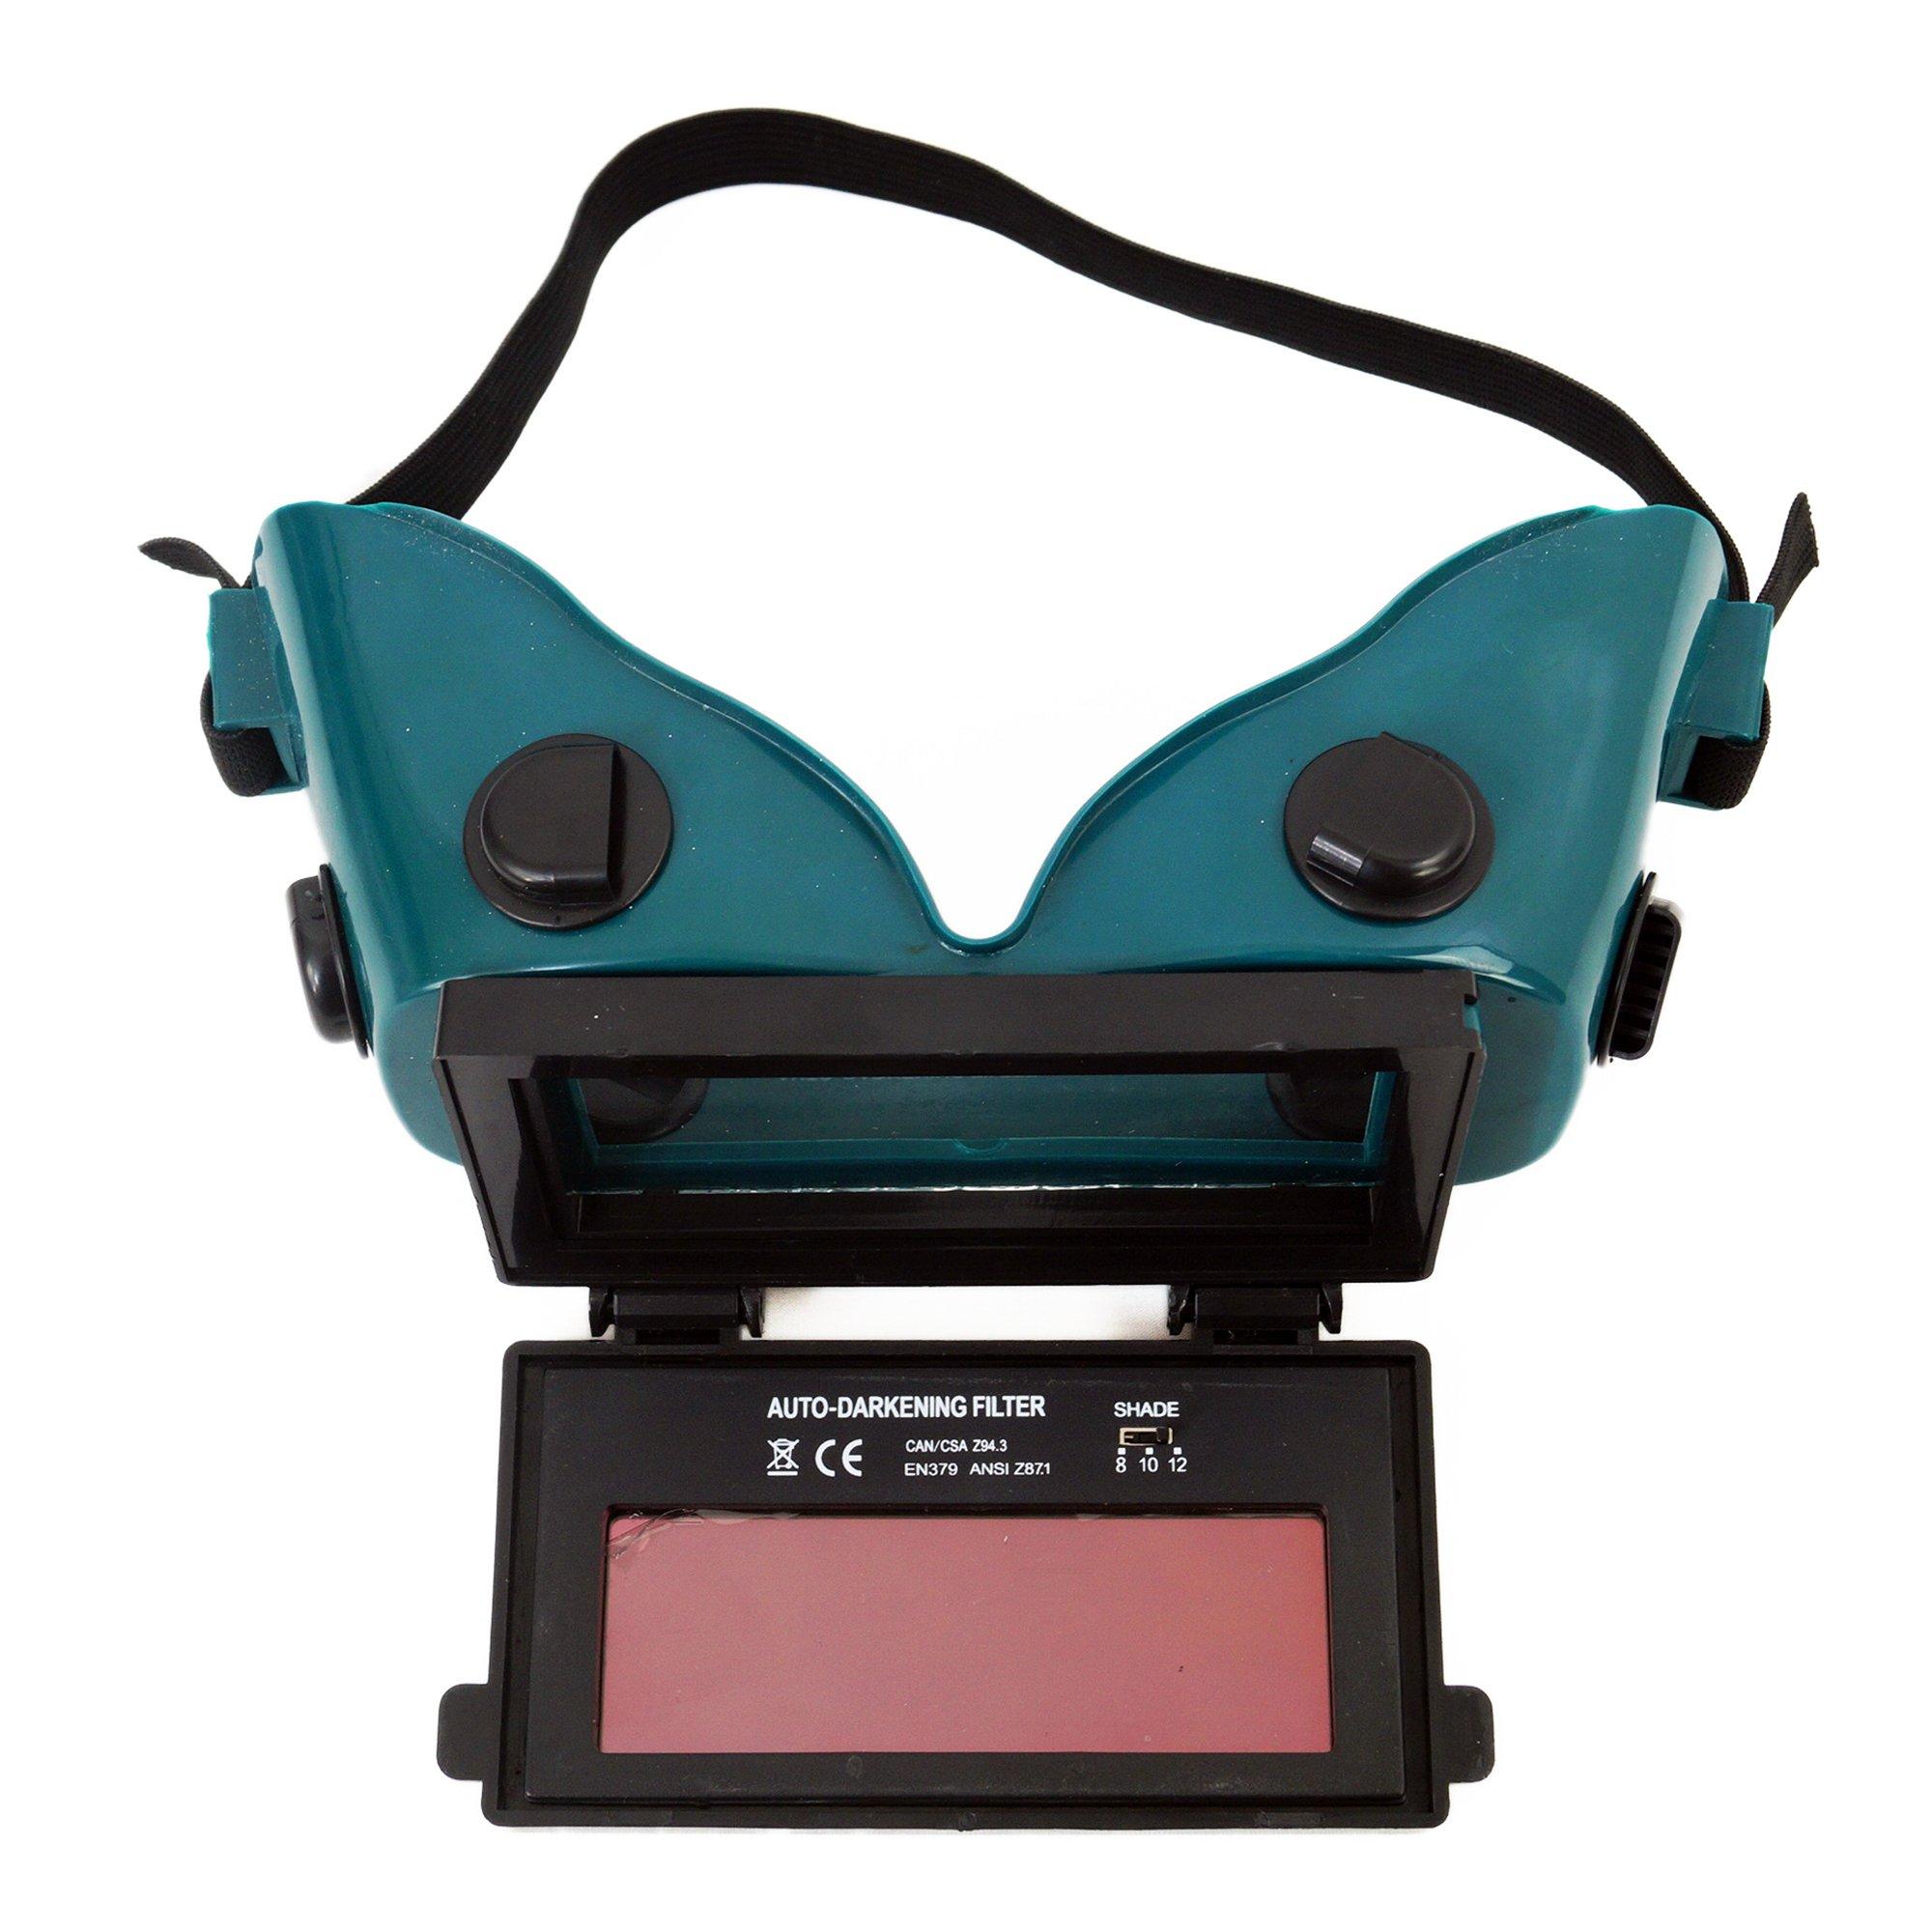 Spargo Auto Darkening LCD Welding Helmet Mask Goggles Solar Welder Eyes Glasses Gas Flip Up Lens Eye Protection by Spargo (Image #3)